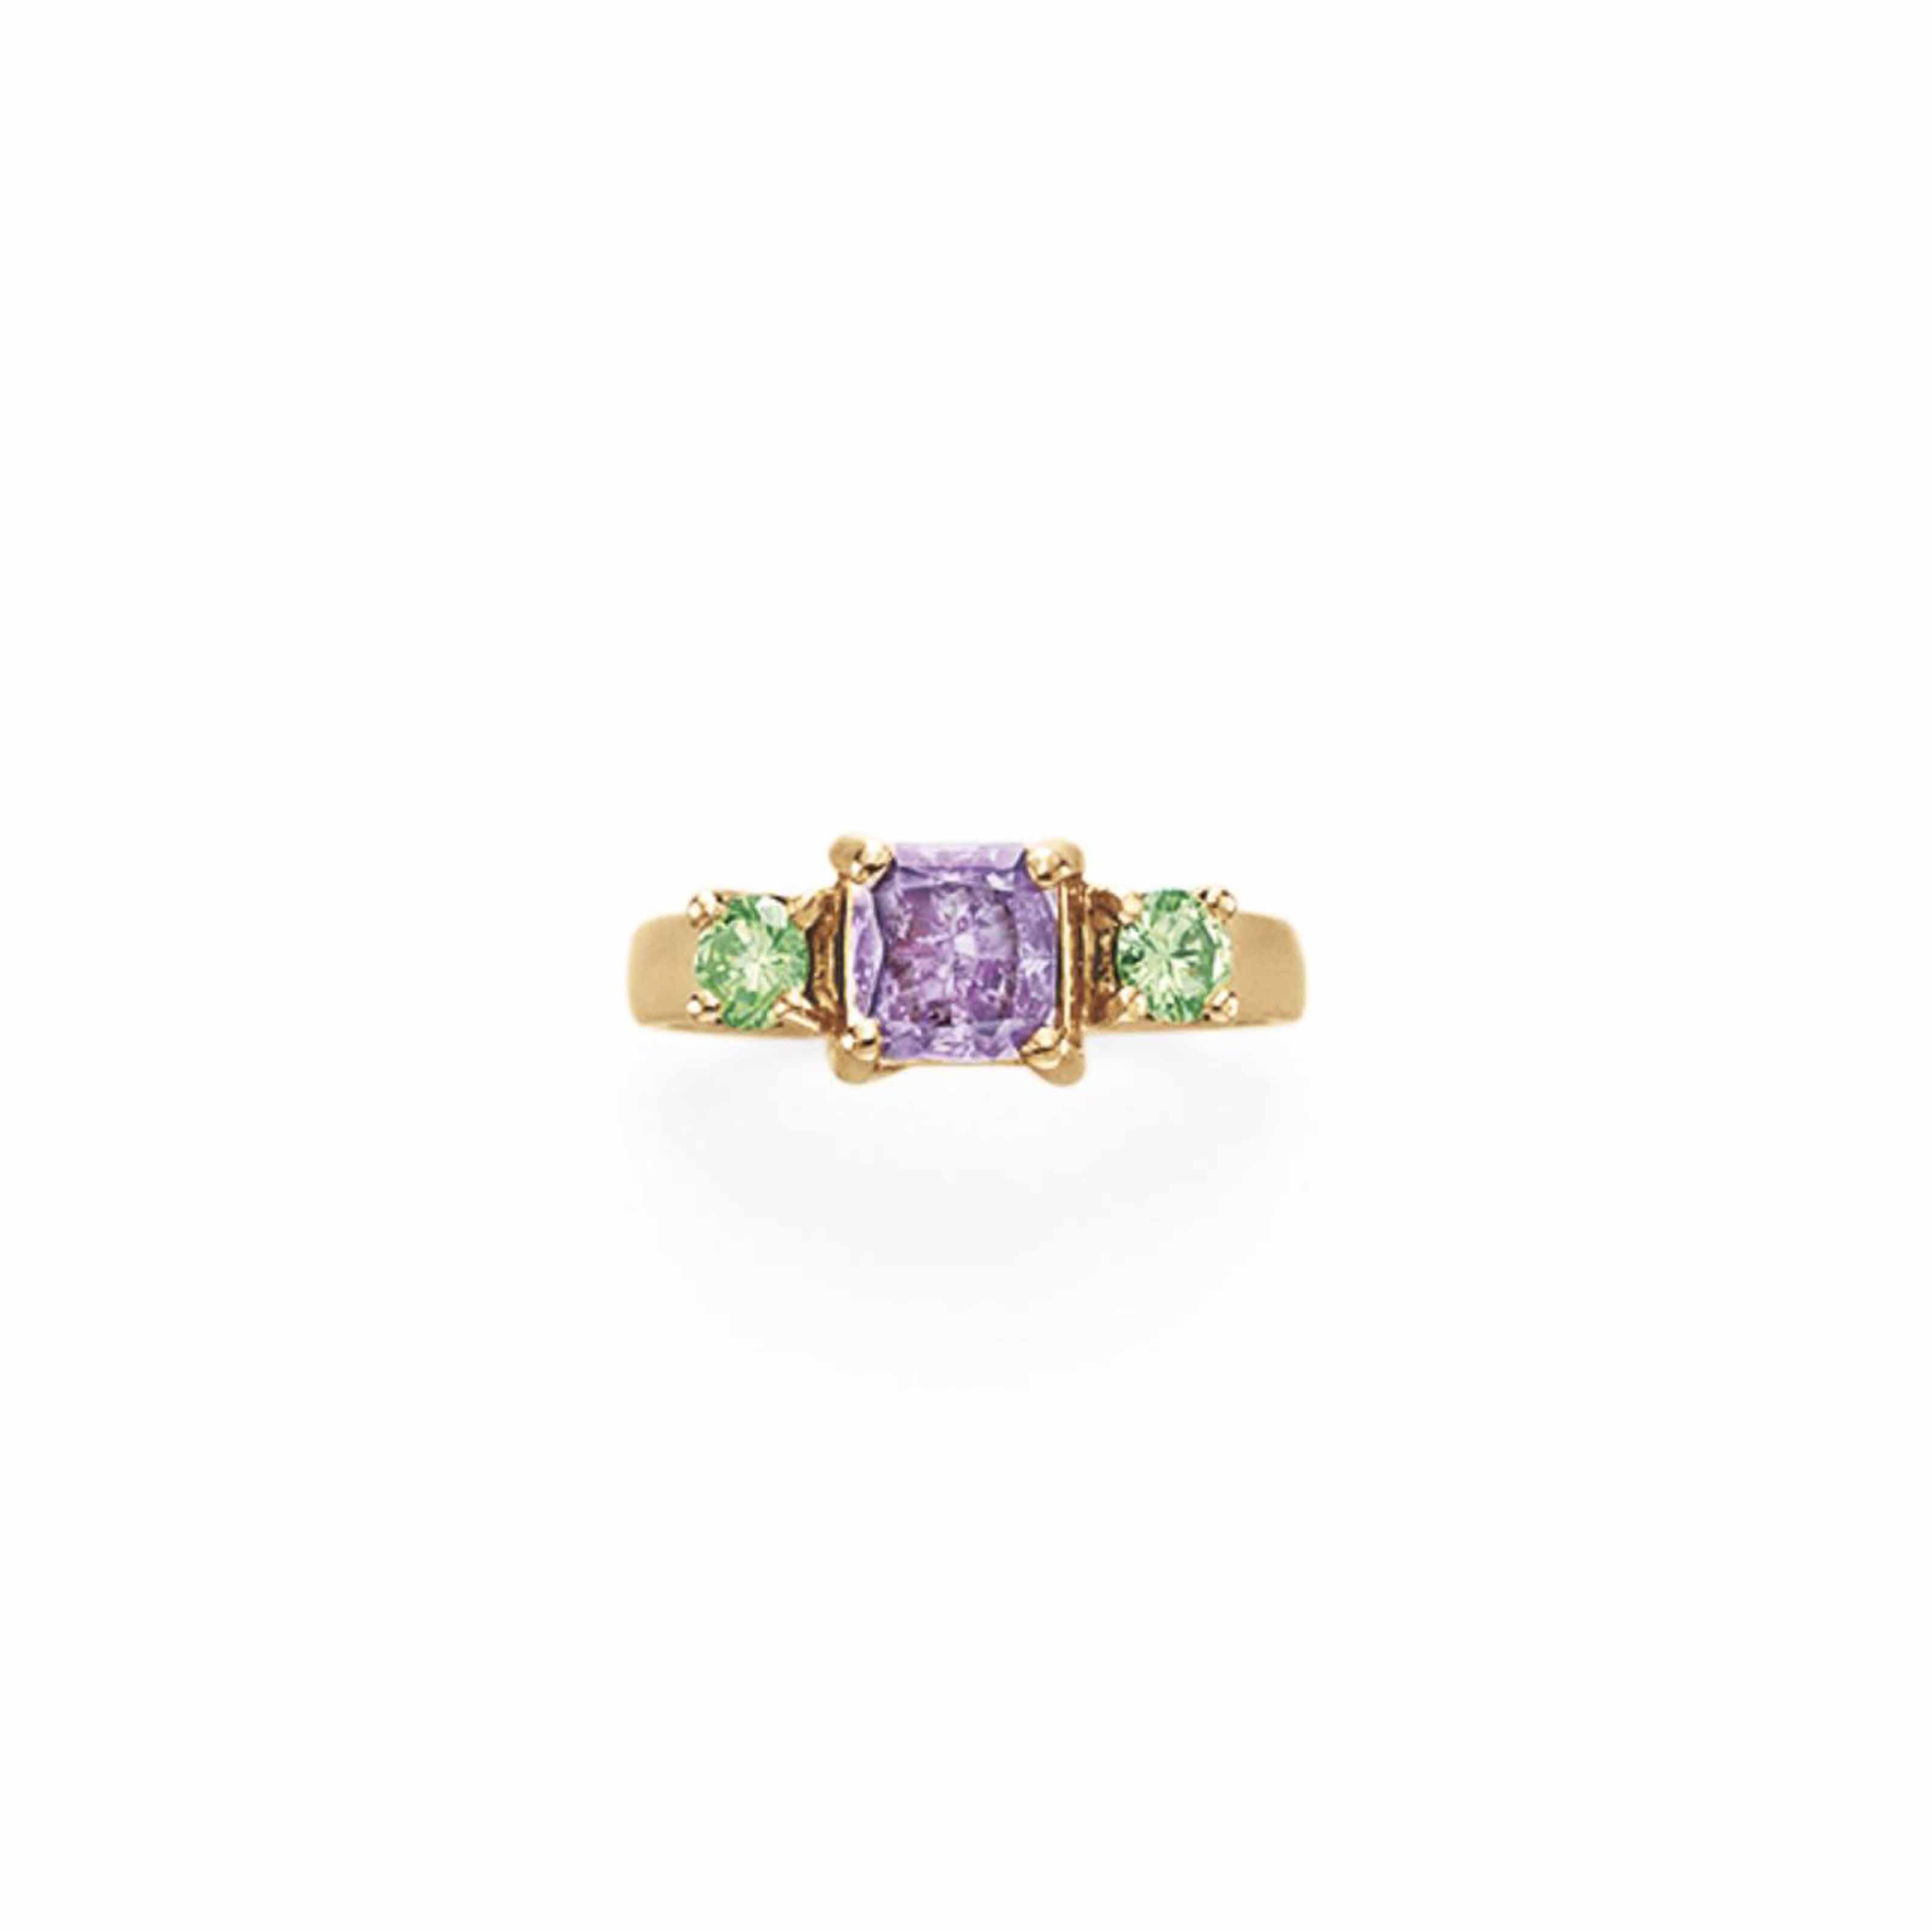 A COLORED DIAMOND RING